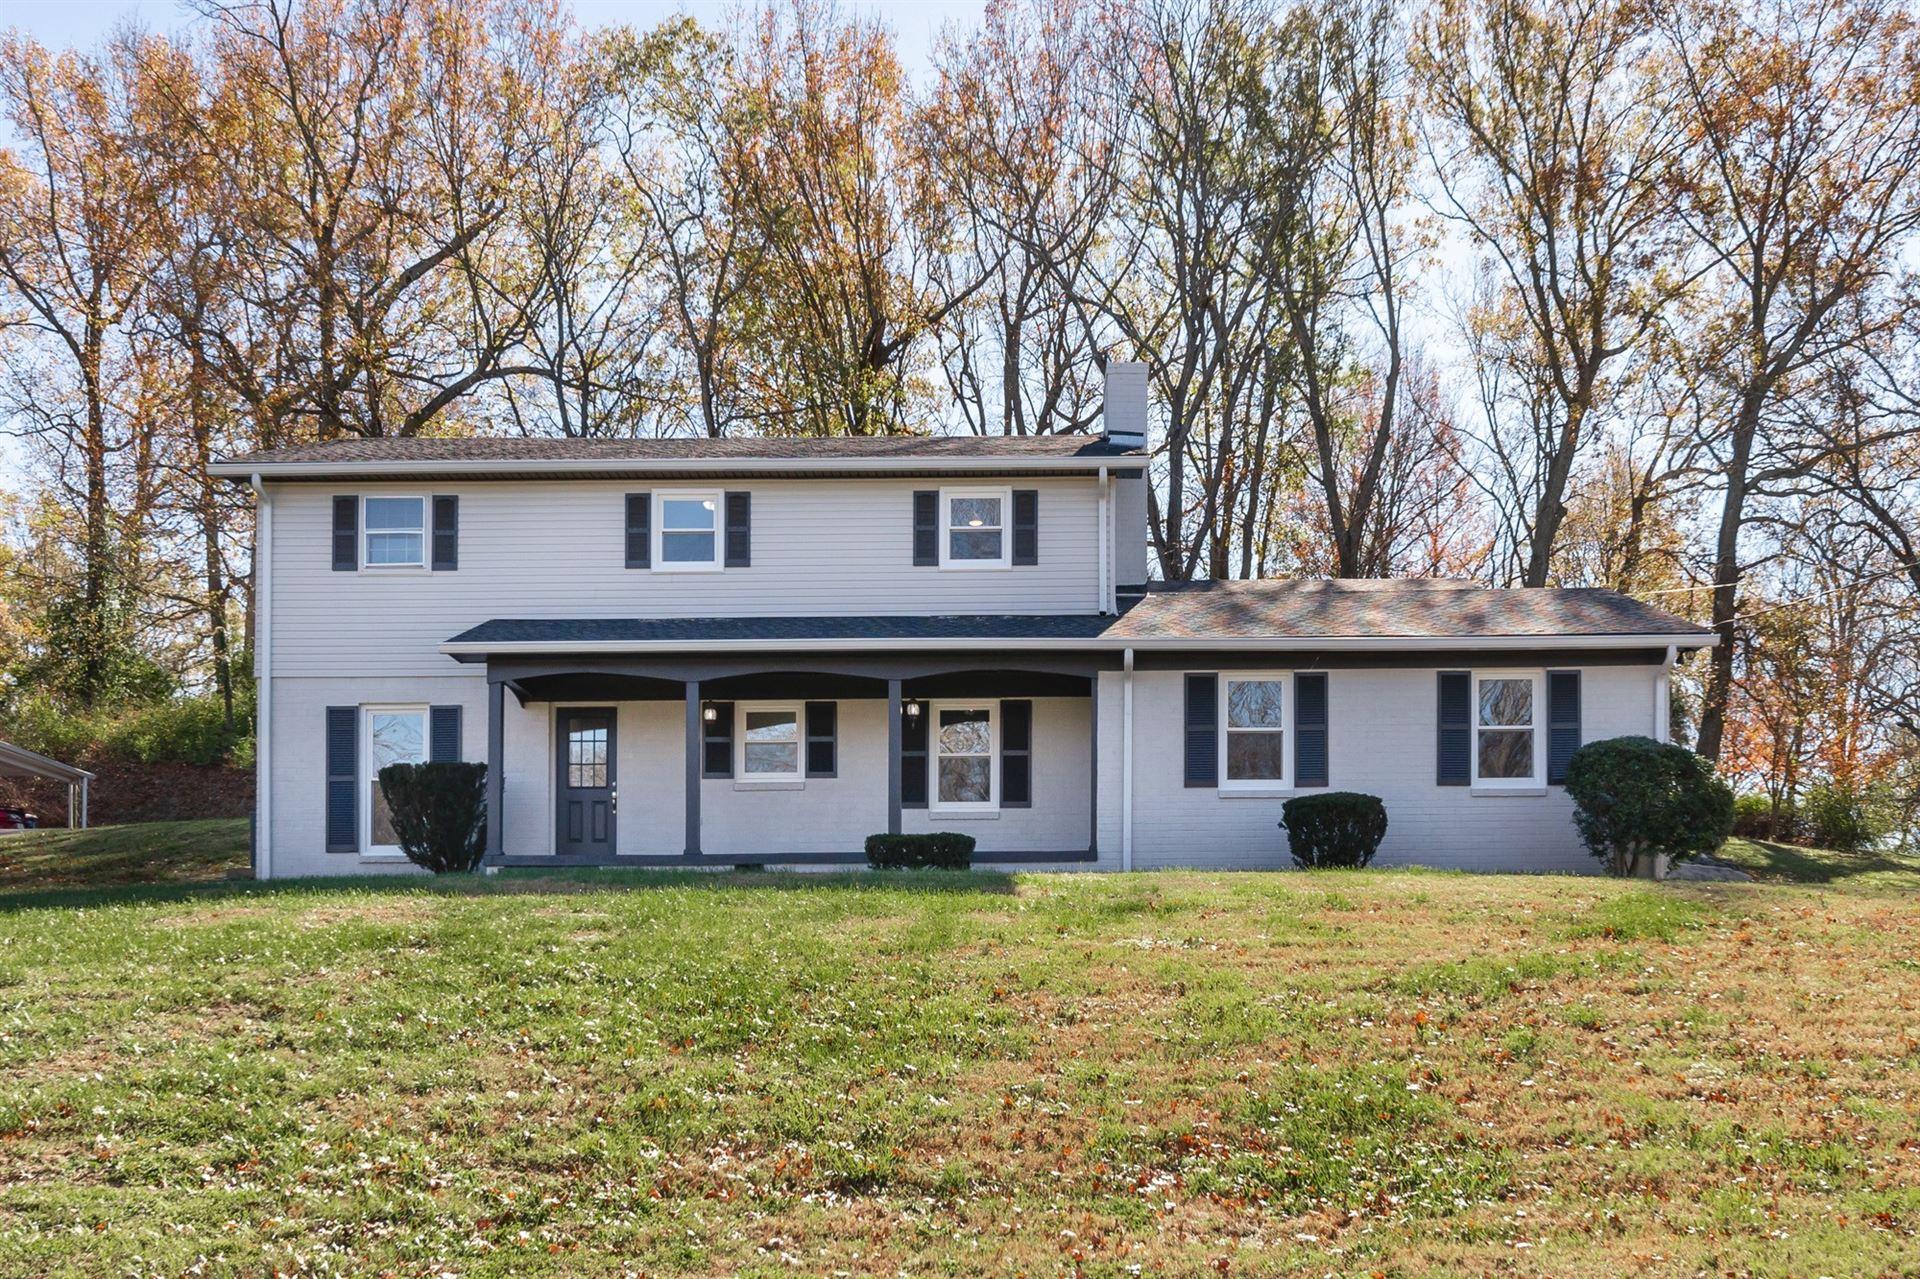 709 Pleasantwood Dr, Mount Pleasant, TN 38474 - MLS#: 2207745